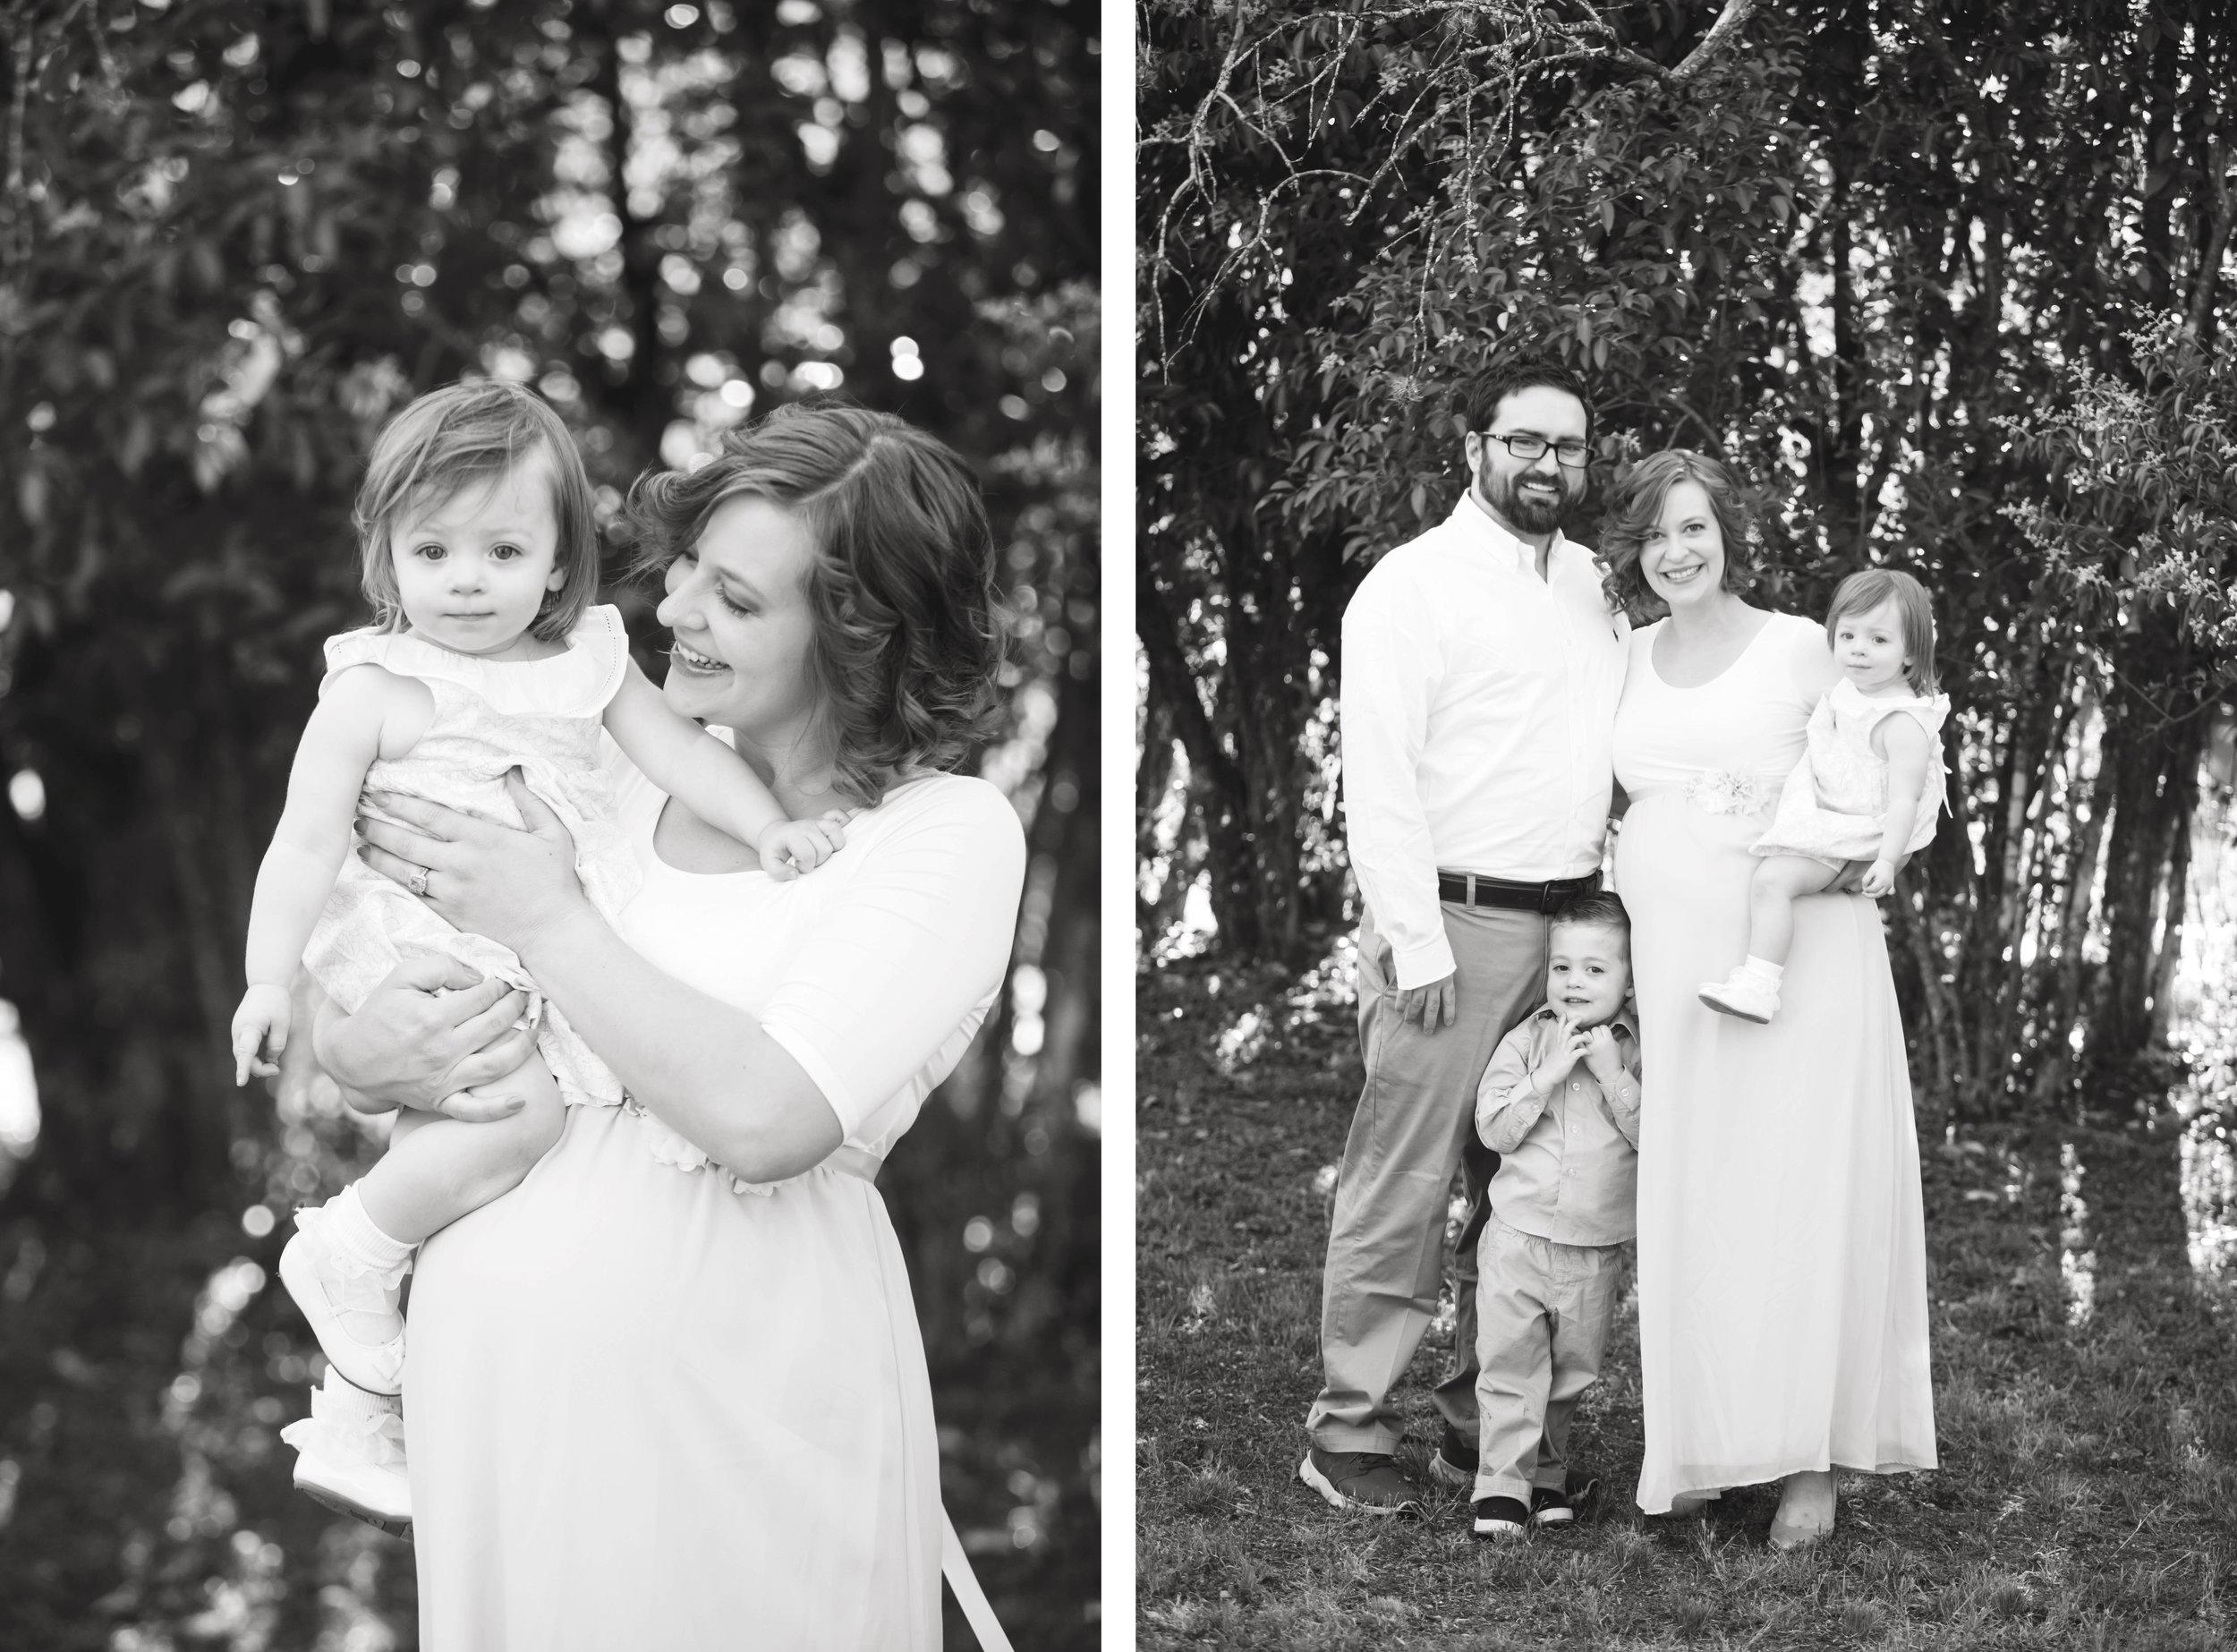 Marble_Falls_Leger_Family_Photographer_Jenna_Petty_03.jpg